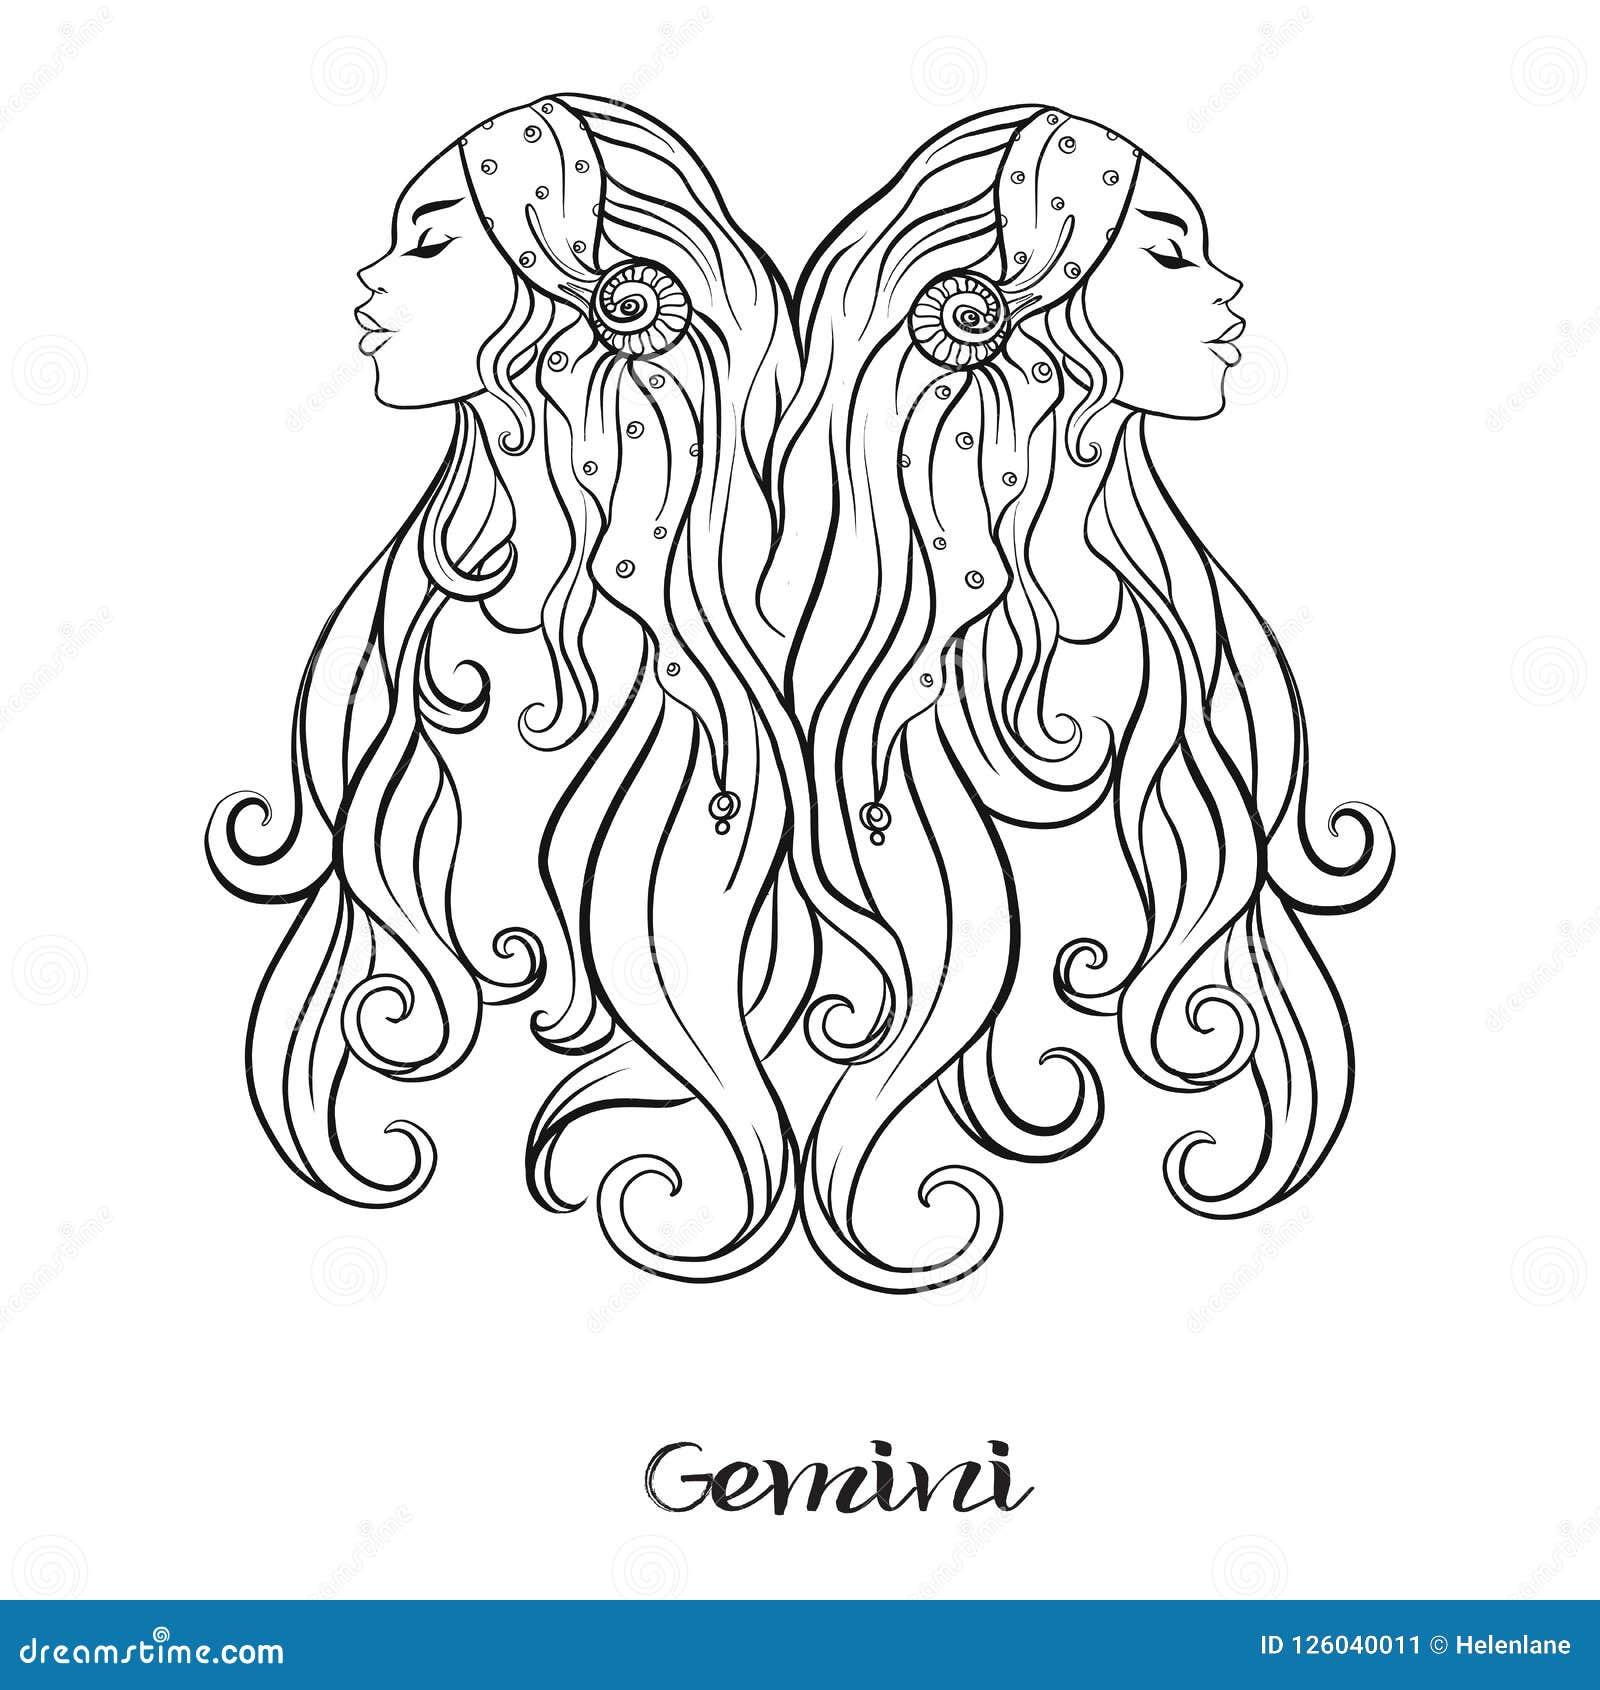 Gemini Coloring Pages Stock Illustrations – 28 Gemini Coloring ... | 1690x1600